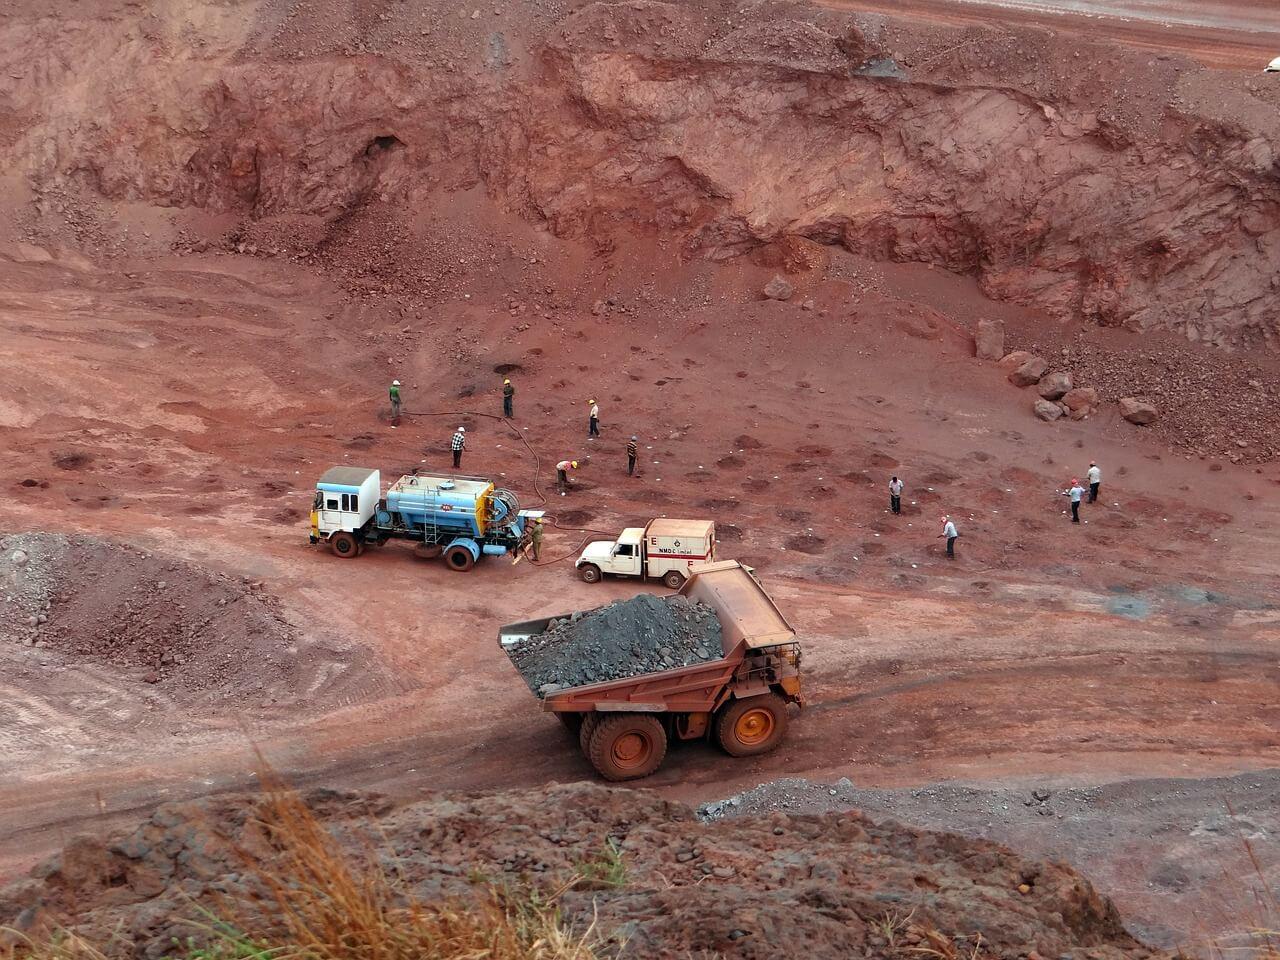 Iron ore transport